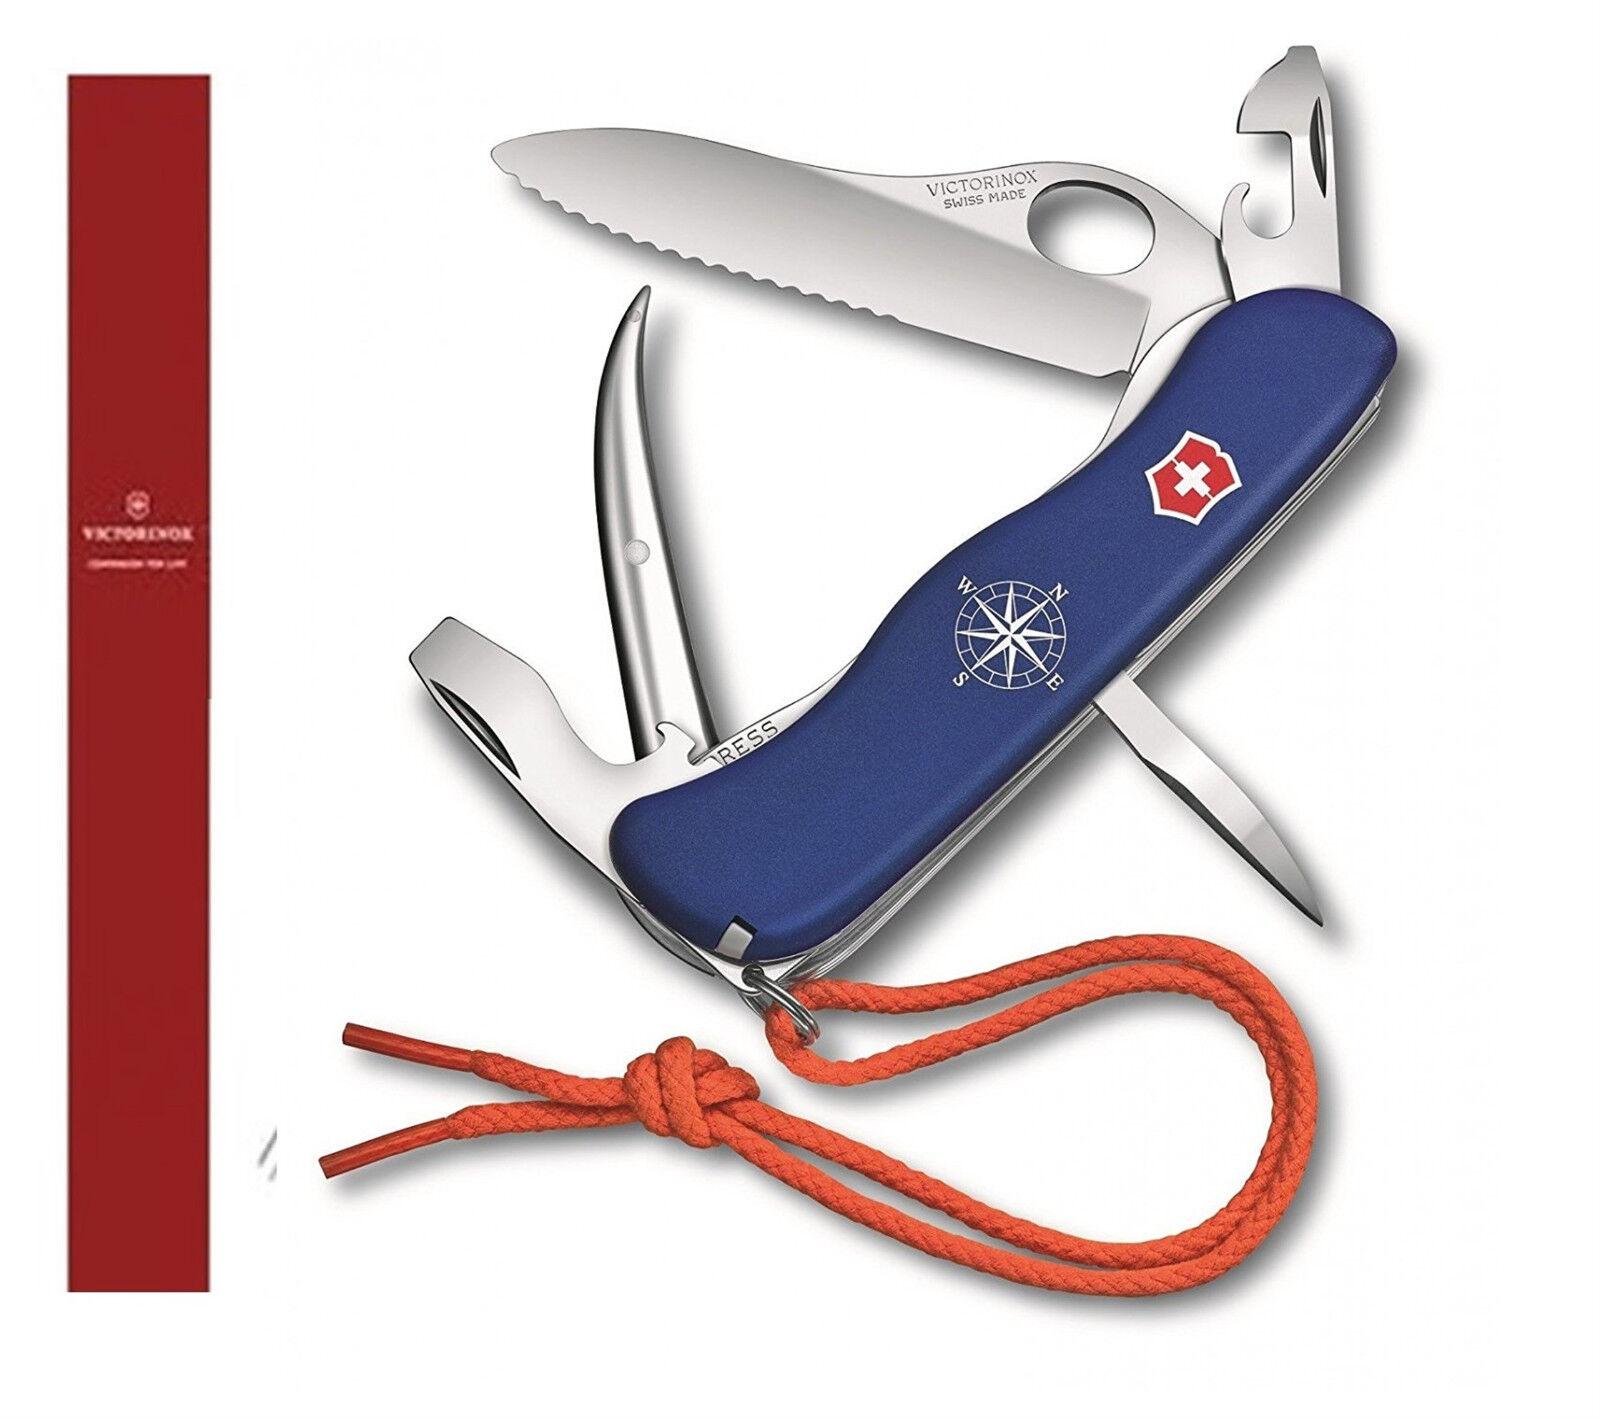 Victorinox Pro 0.8503.2MW Bleistiftspitzer Segeln Modell Skipper knife 13